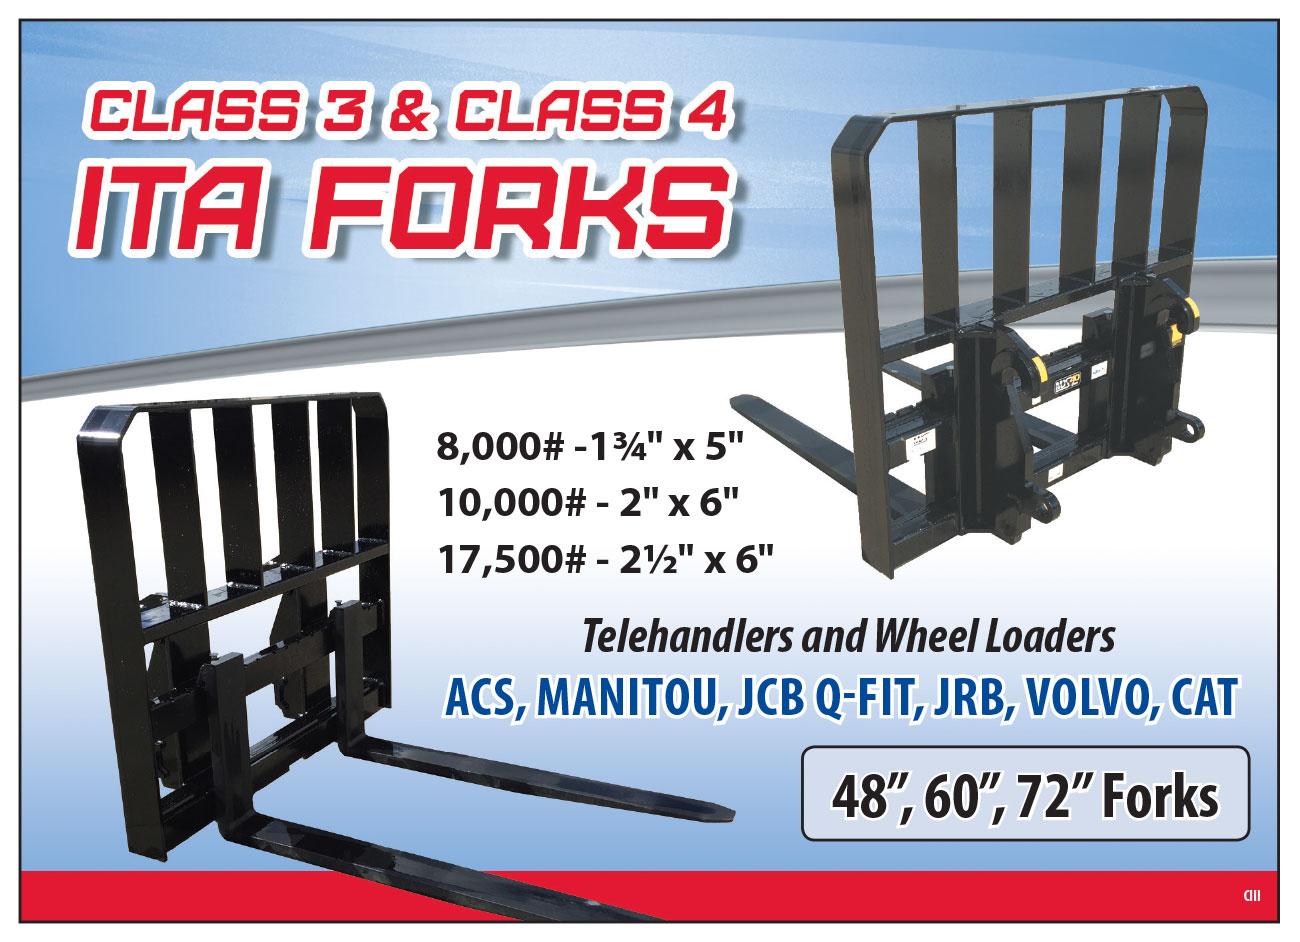 Class 3 & 4 ITA Forks